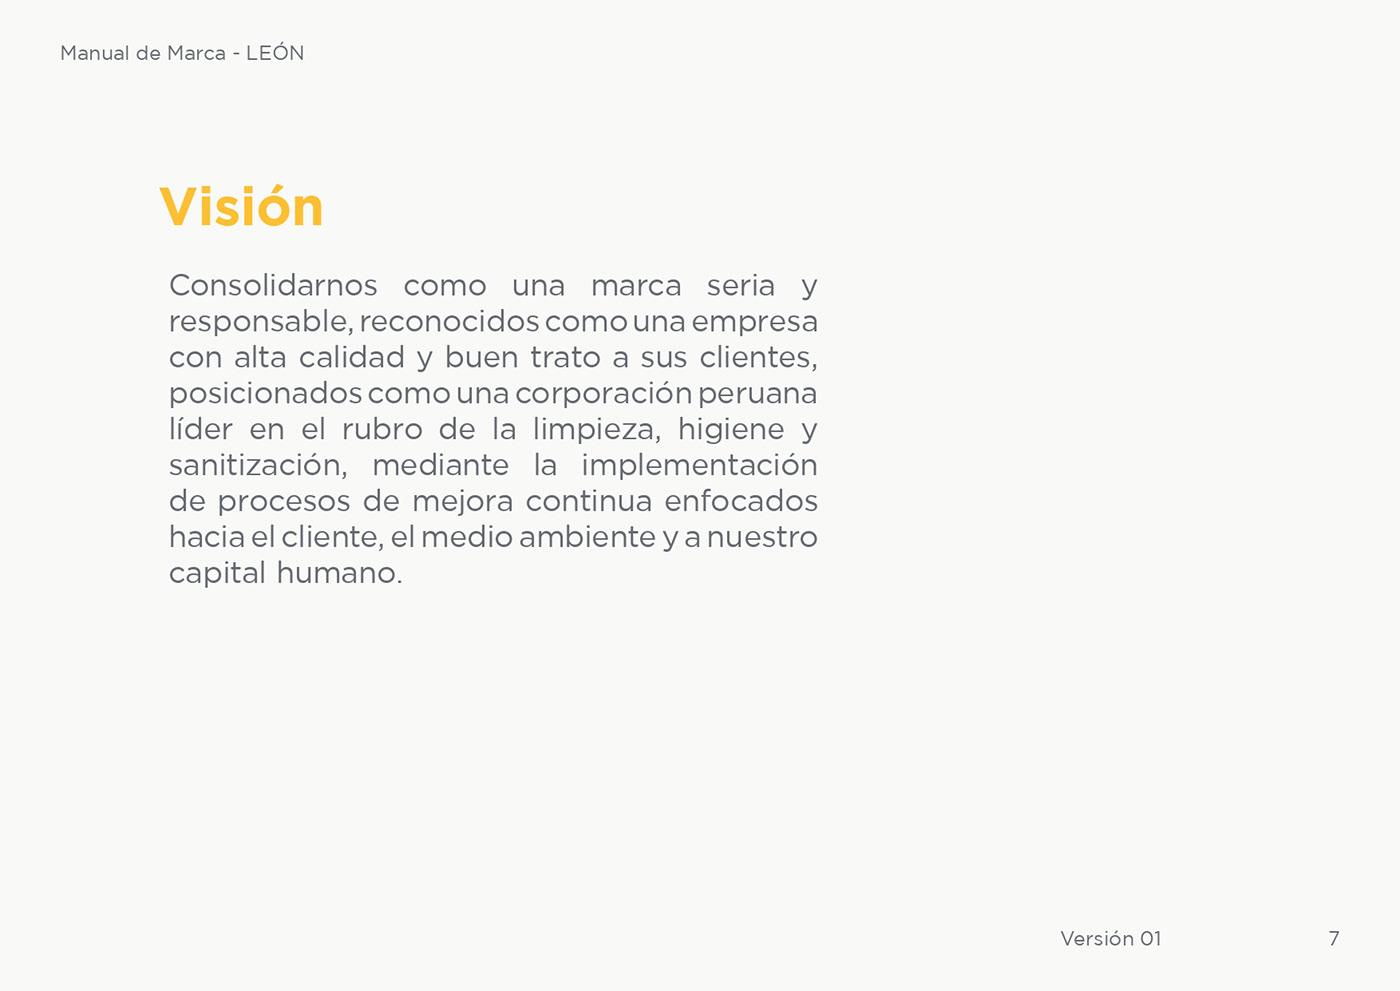 brandbook branding  design editorial guideline Leon marca